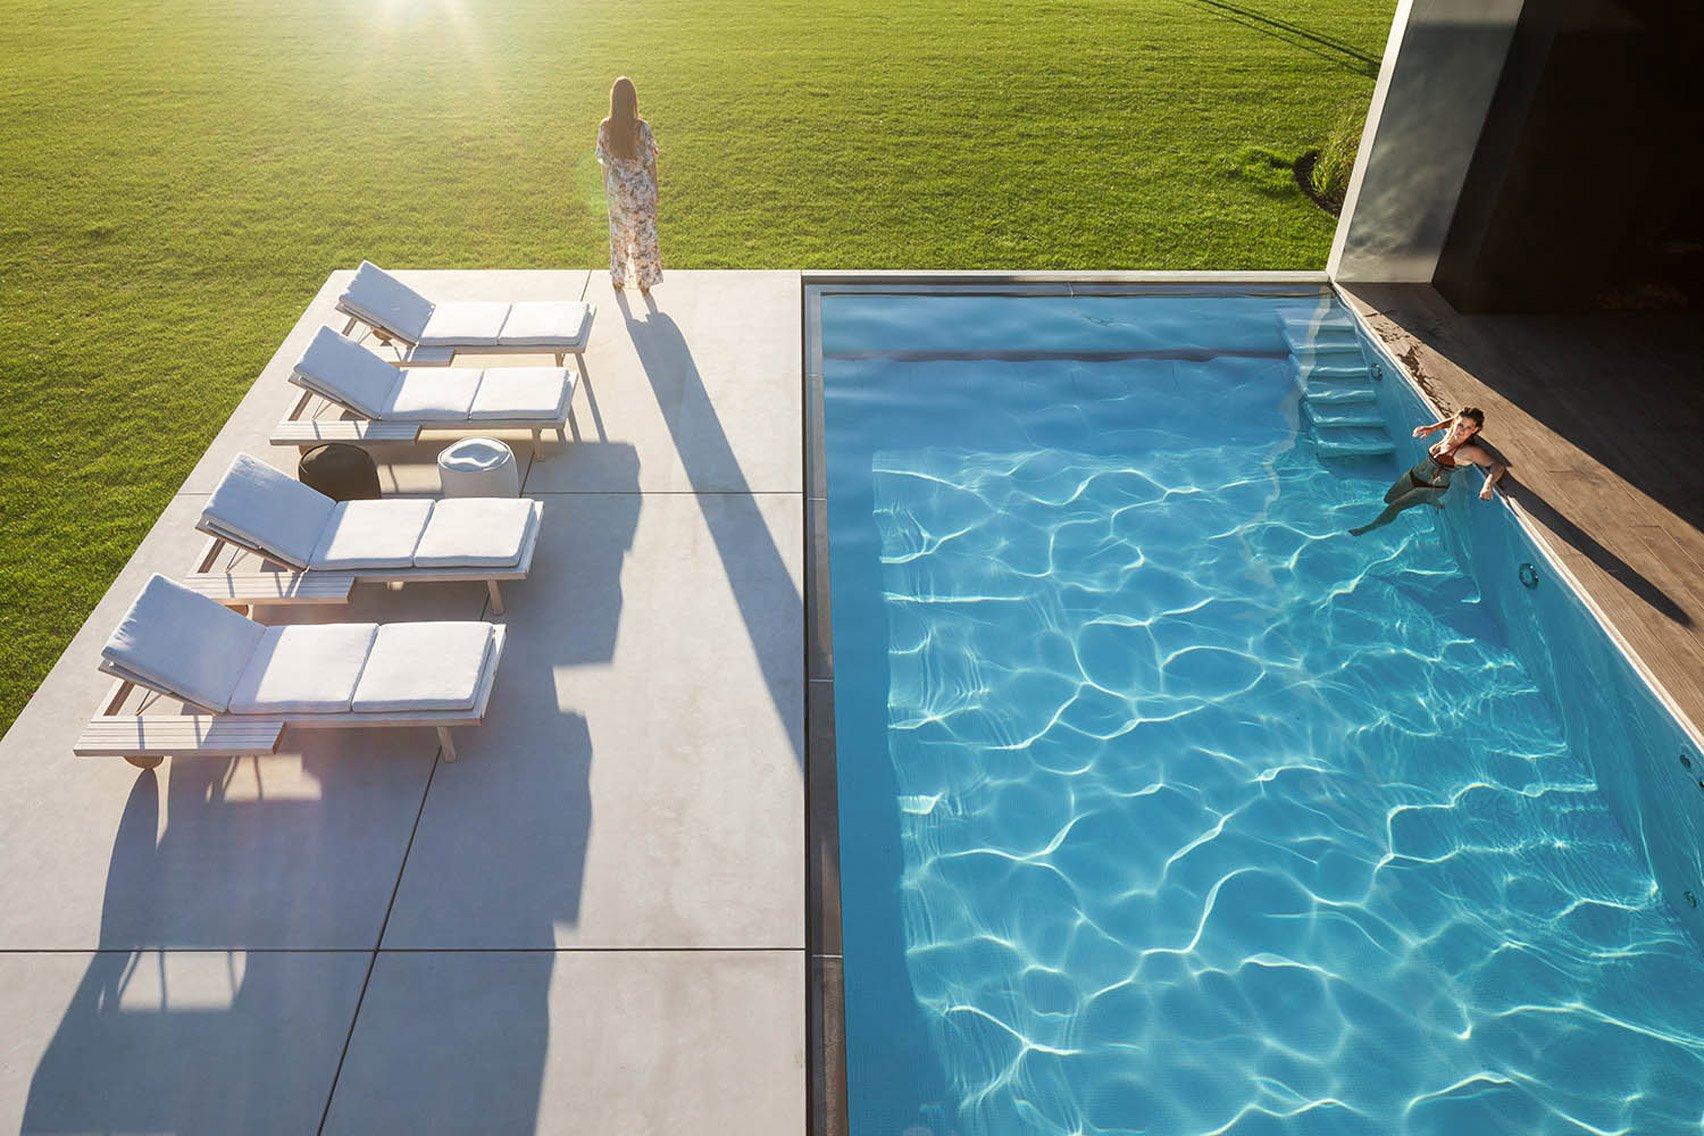 La piscina della casa / Govaert & Vanhoutte Architects